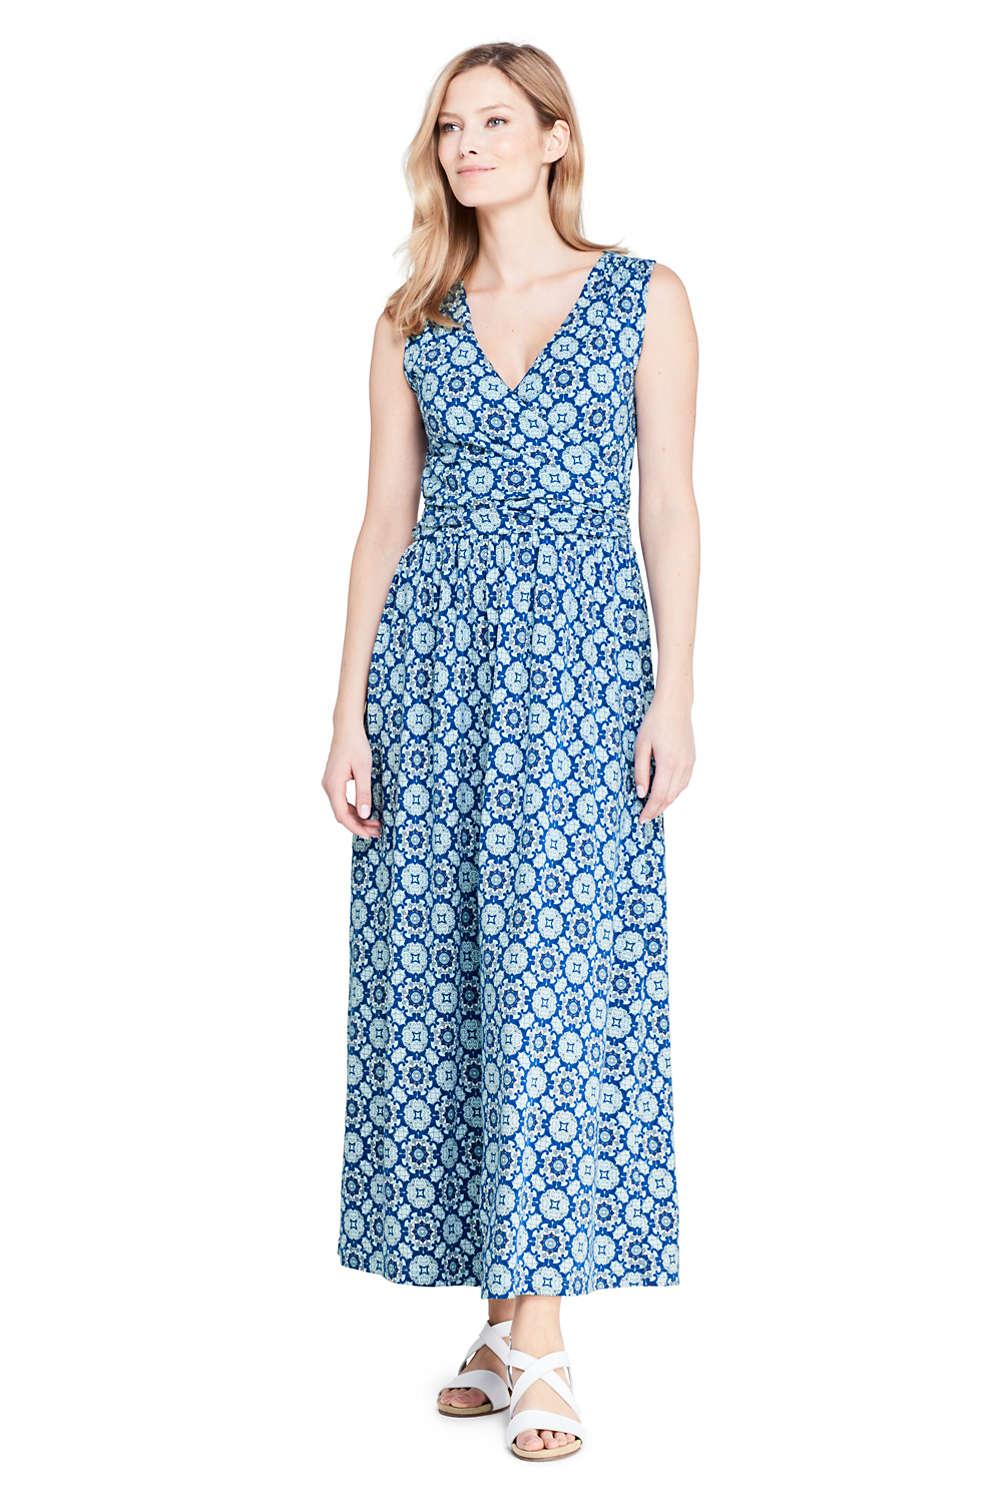 4b321c1ad0 Women's Knit Surplice Sleeveless Maxi Dress from Lands' End